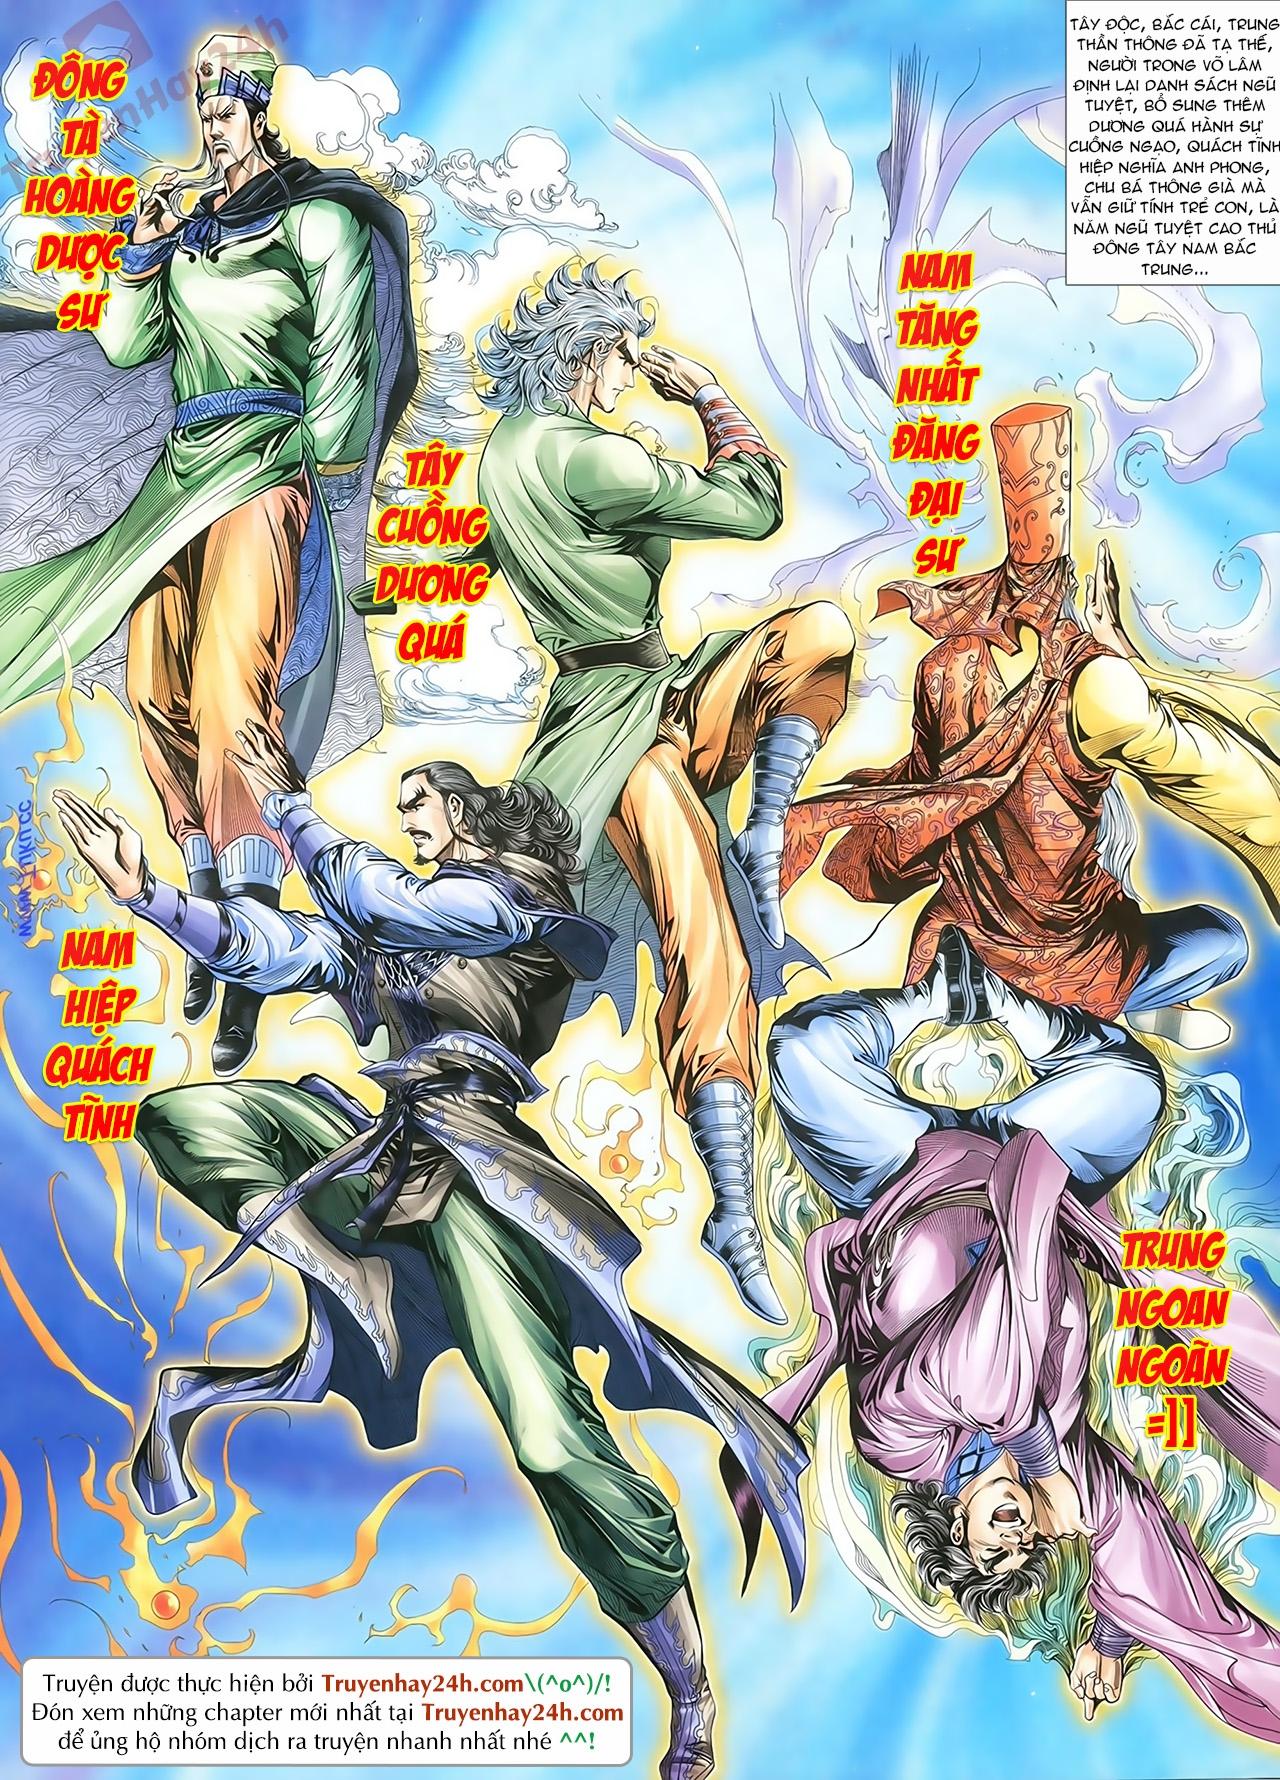 Thần Điêu Hiệp Lữ chap 86 – End Trang 37 - Mangak.info